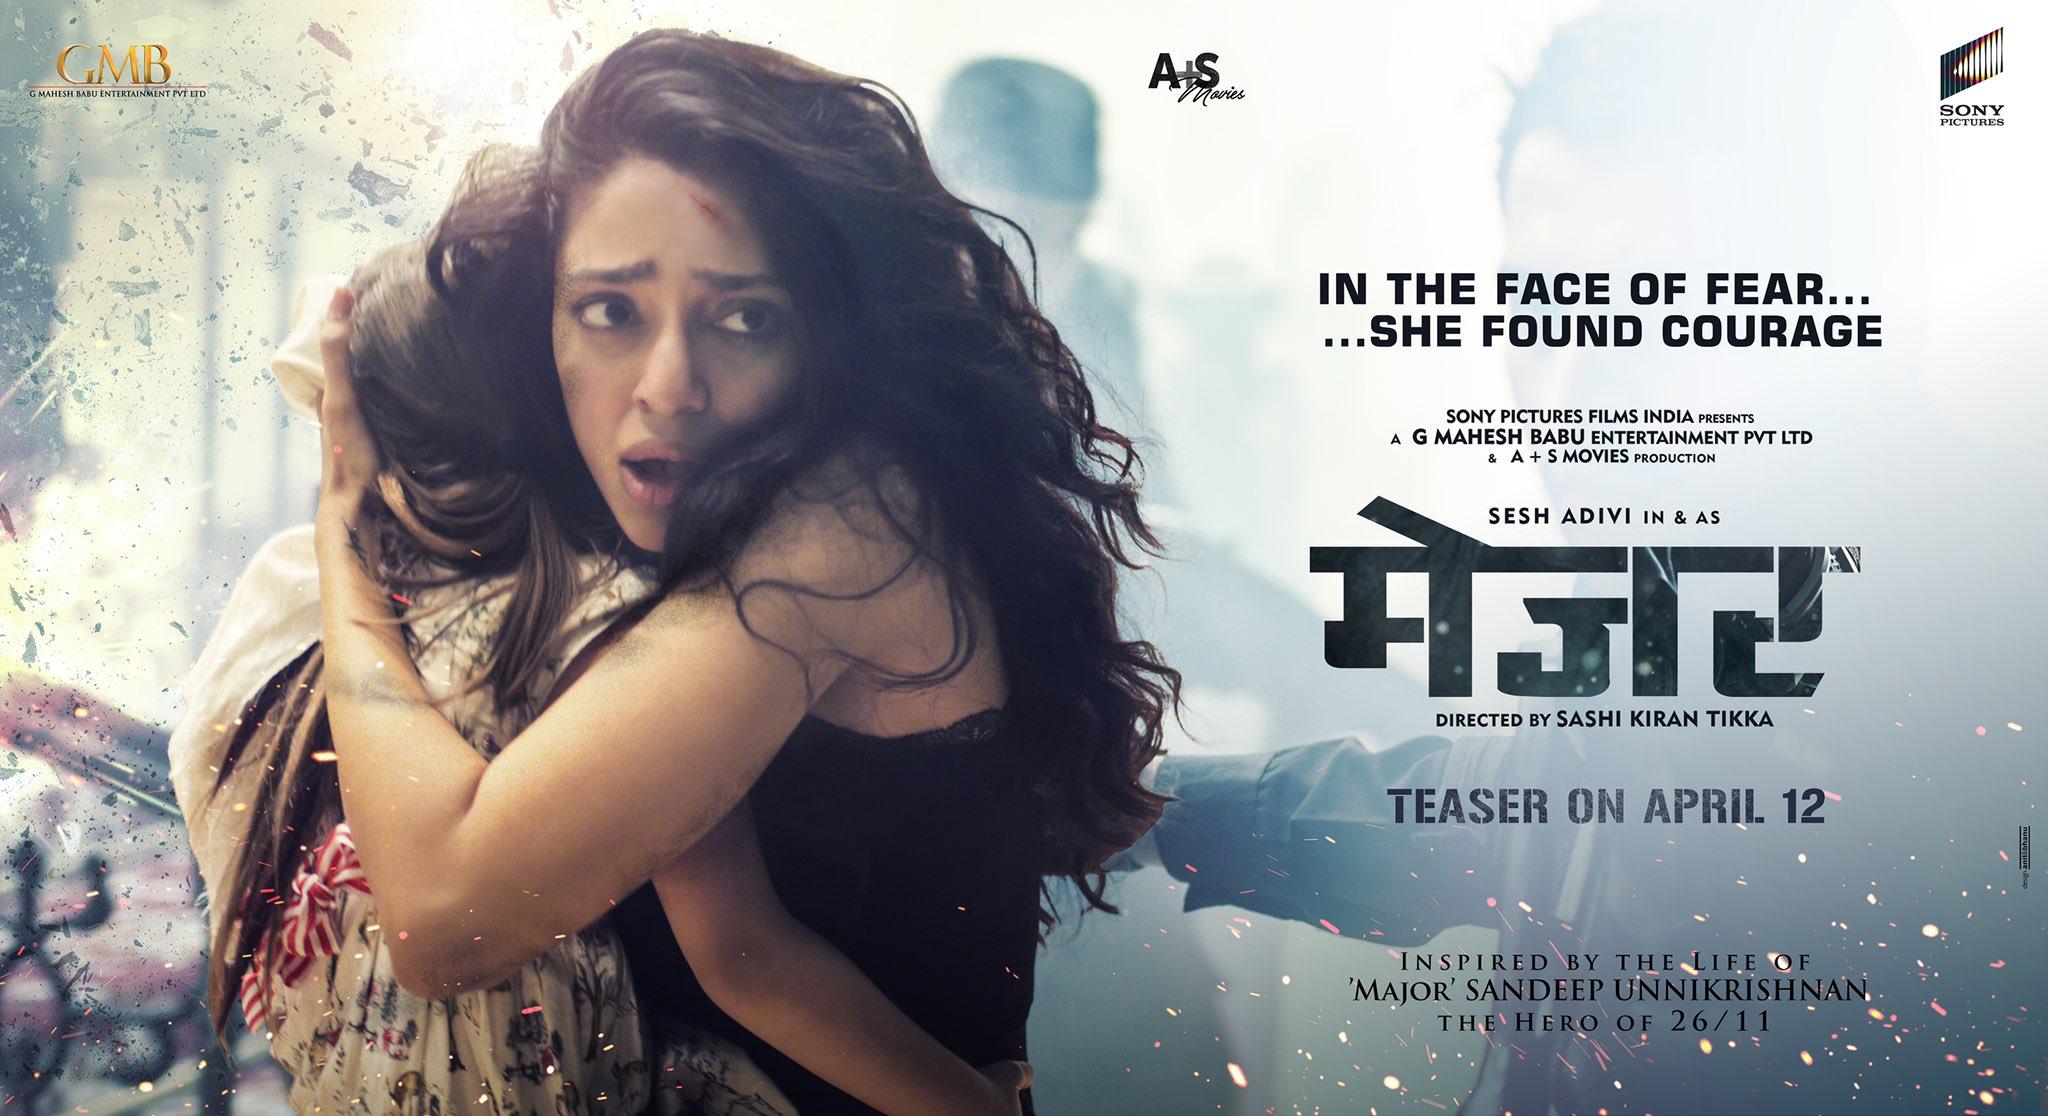 Sobhita Dhulipala Major Movie HD Posters